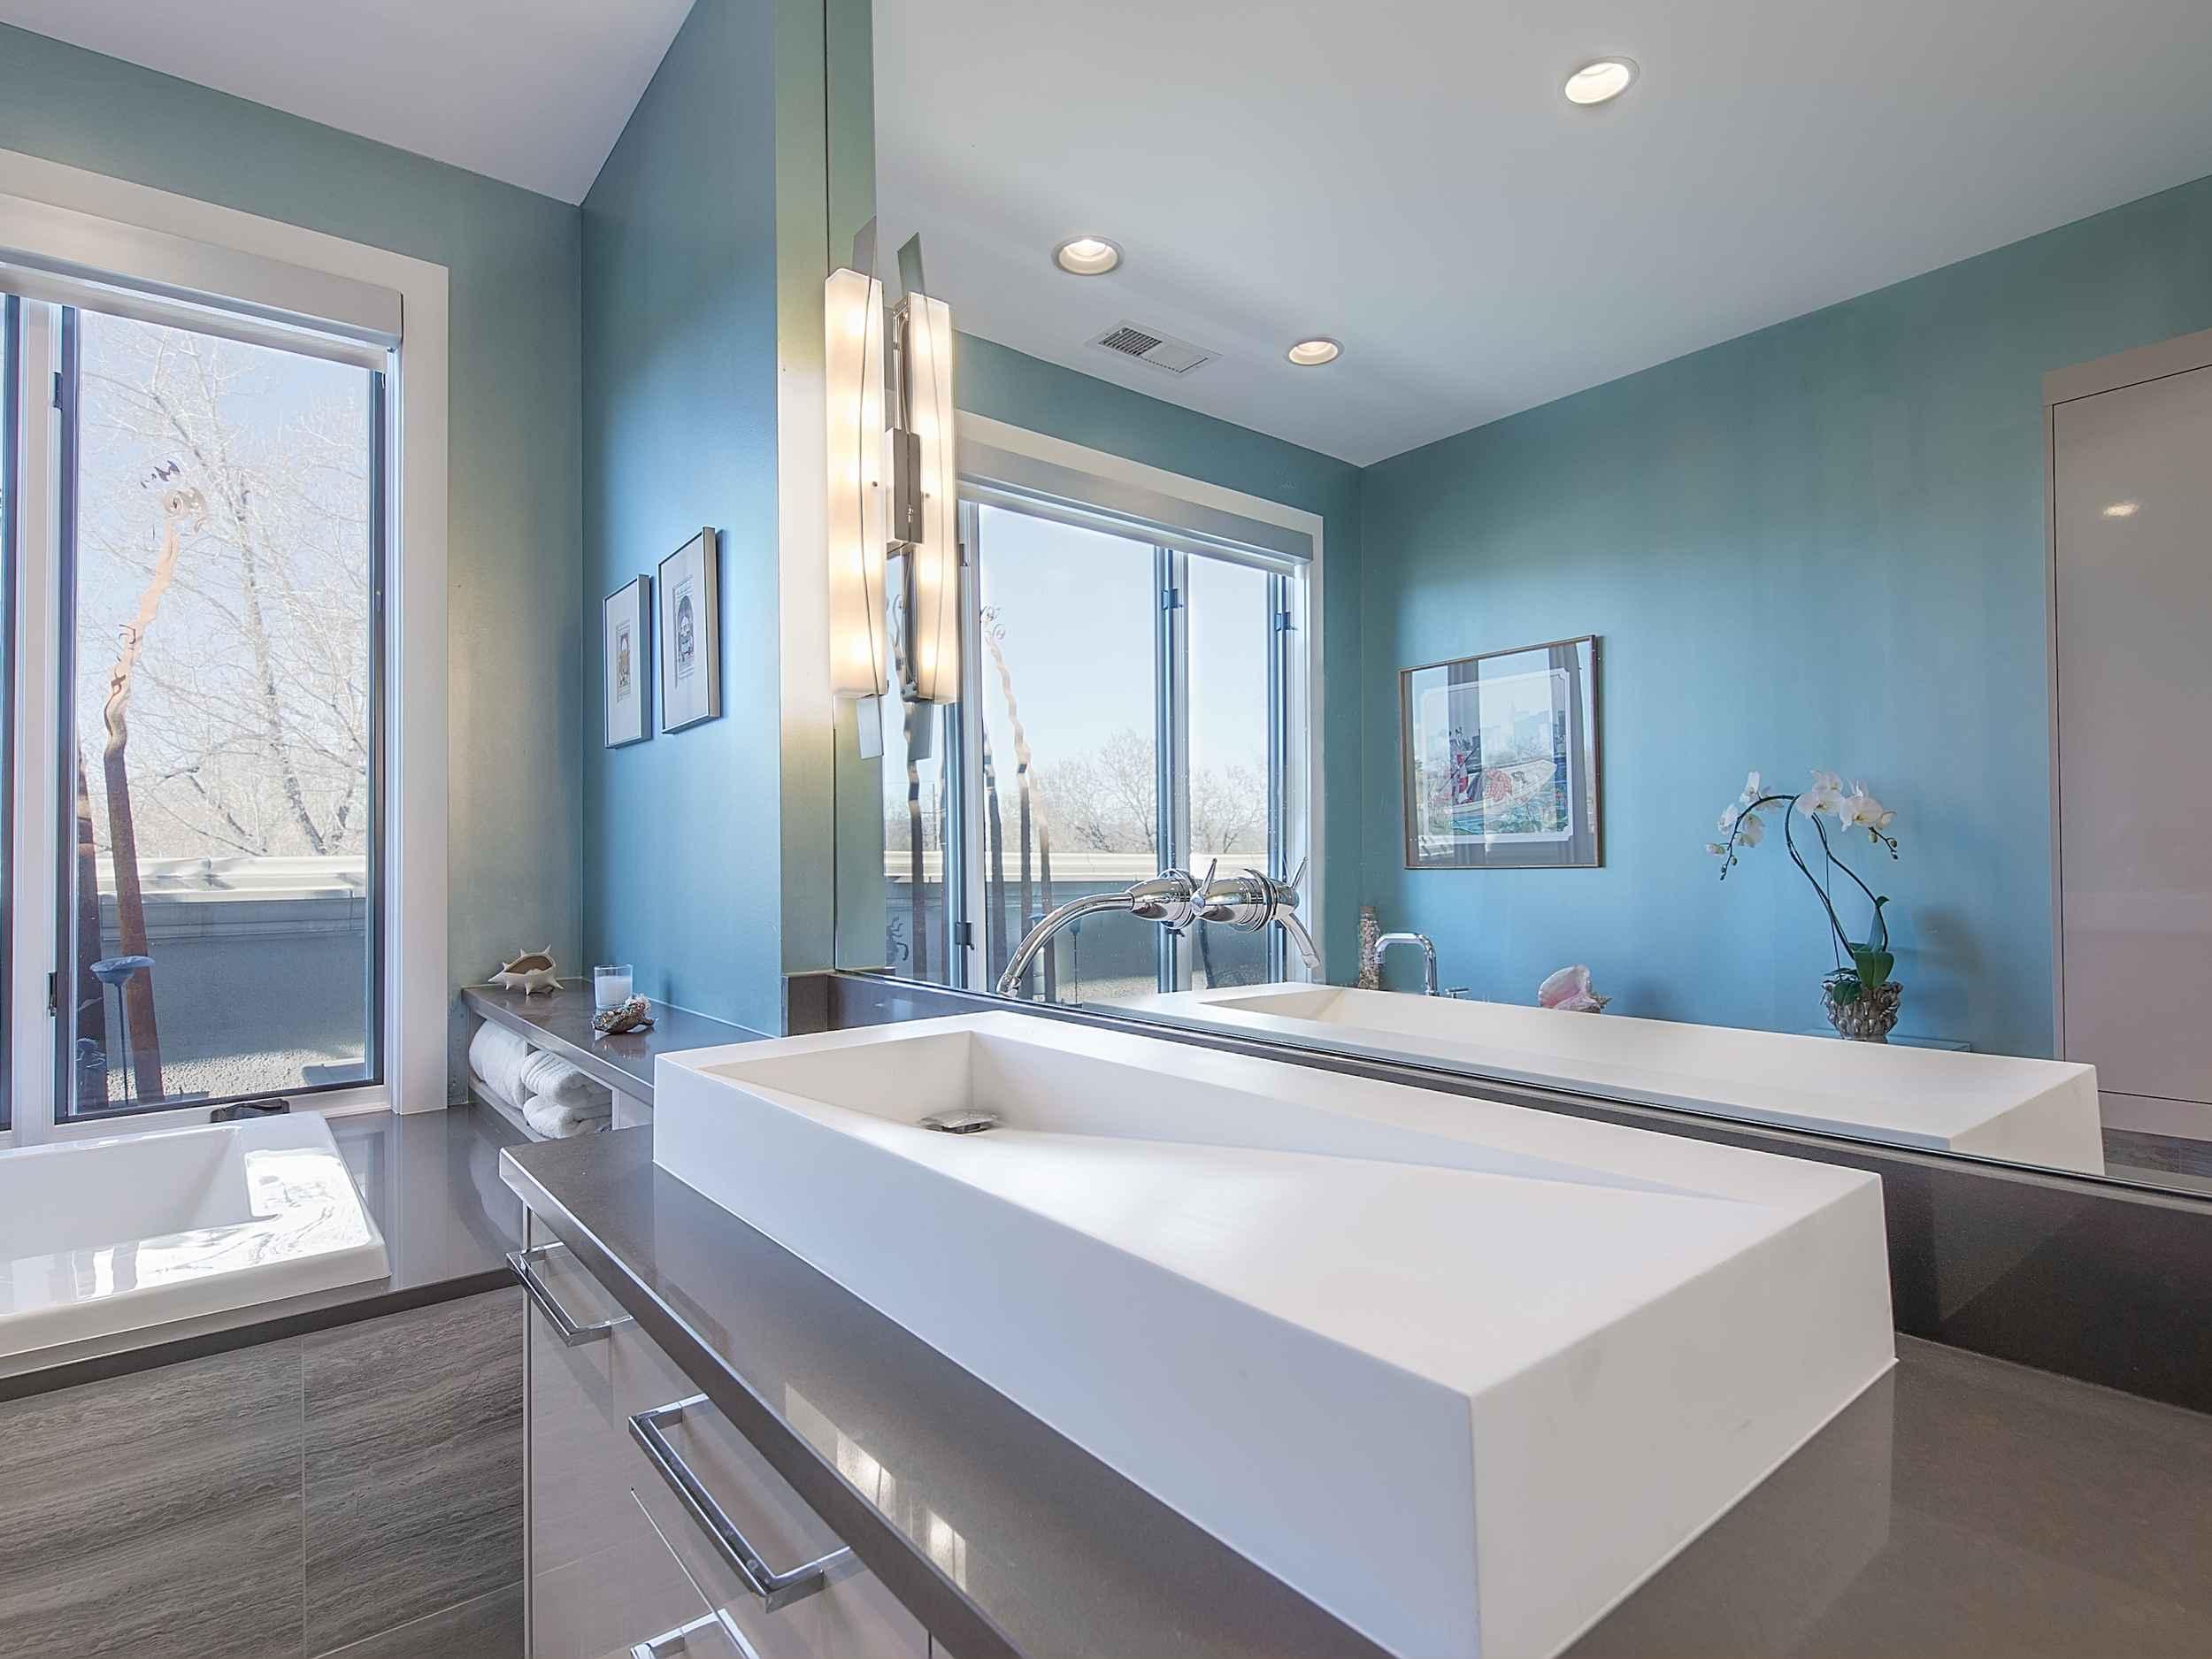 modern sanctuary — sanctuary kitchen and bath design.jpg